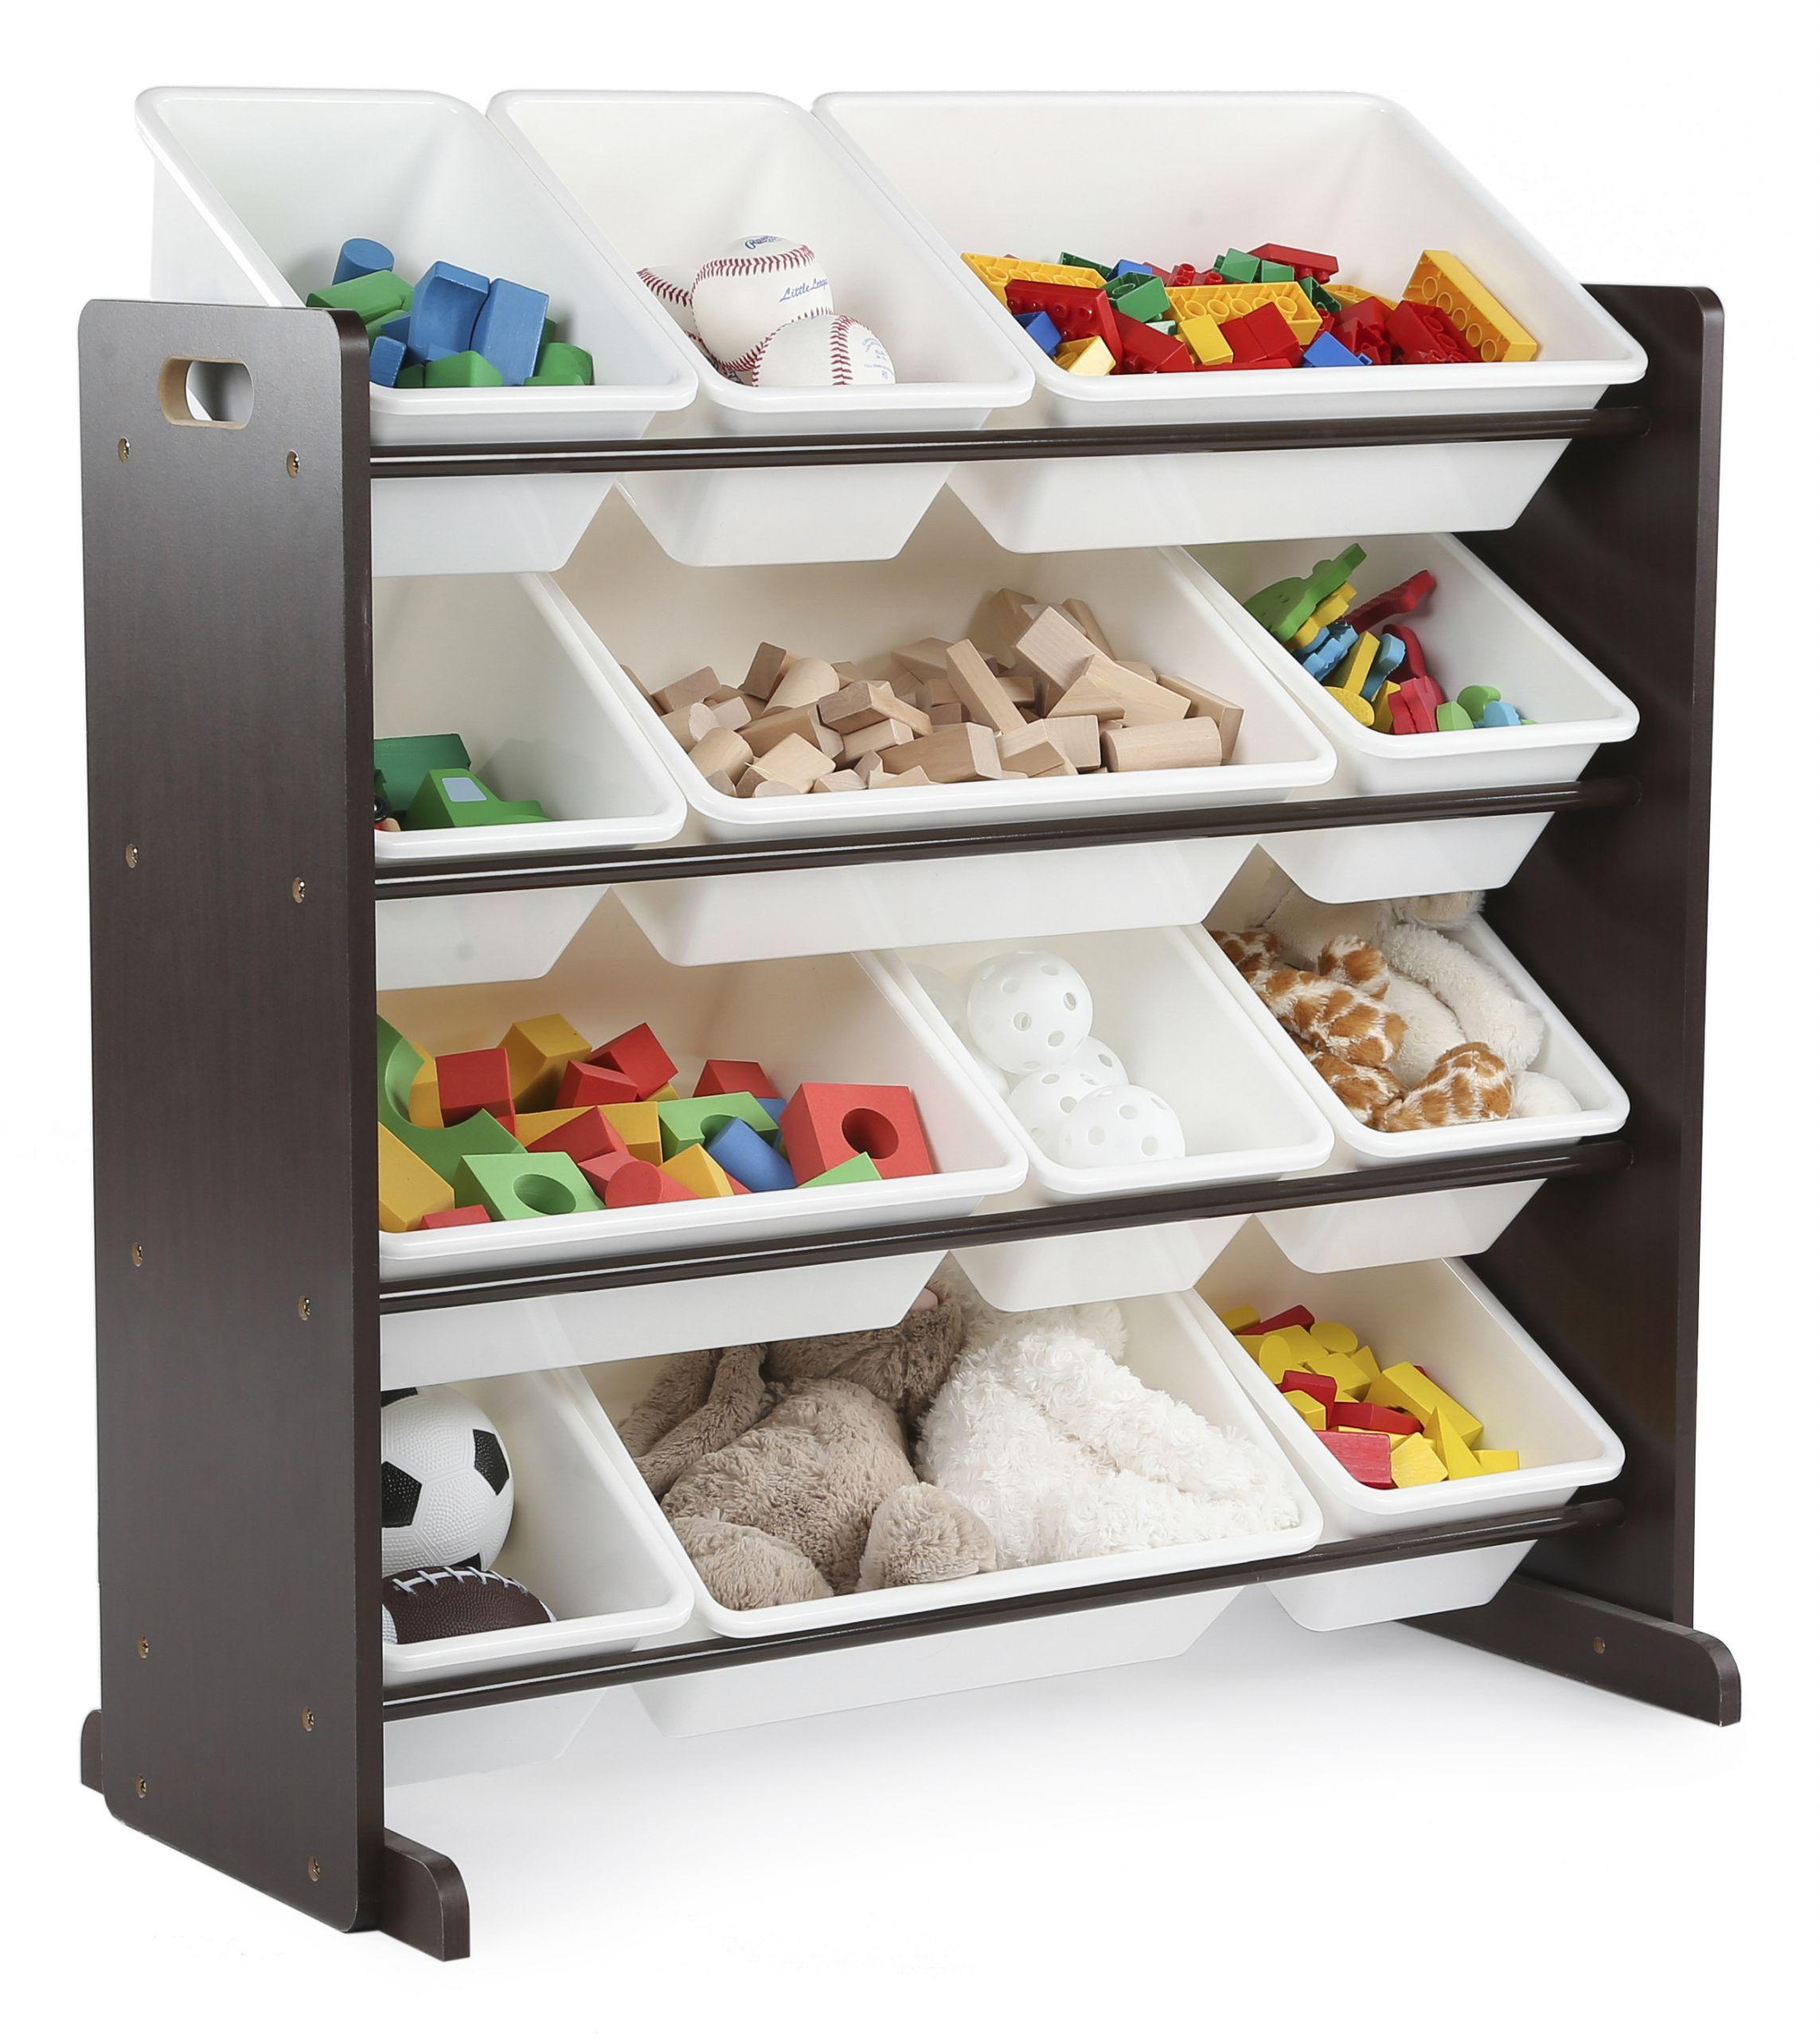 Kids Toys Storage  Tot Tutors Kids Toy Storage Organizer with 12 Plastic Bins